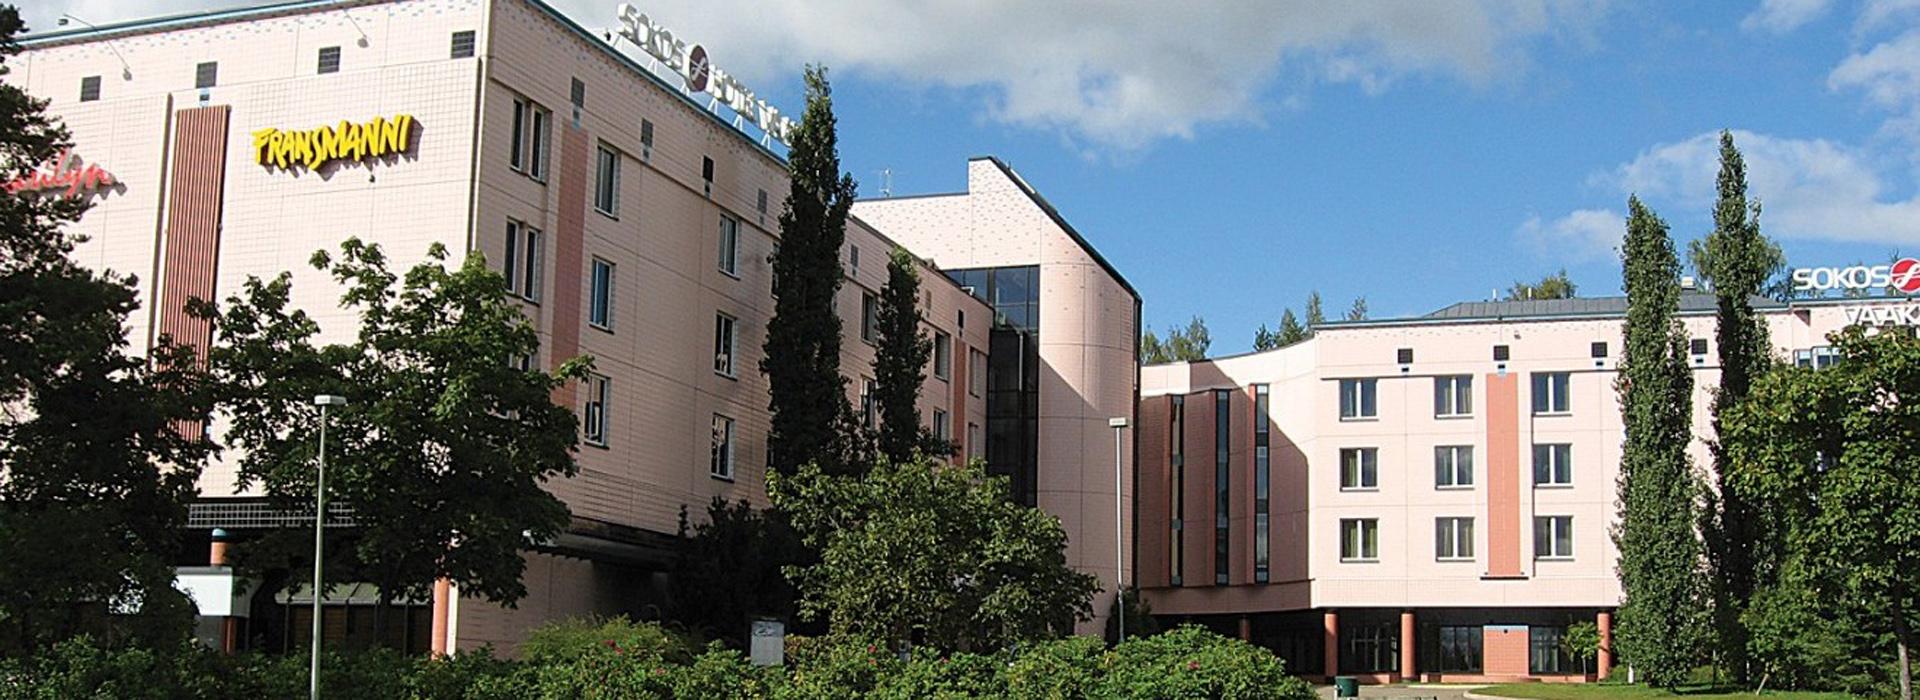 Sokos Hotel Pasila Ravintola